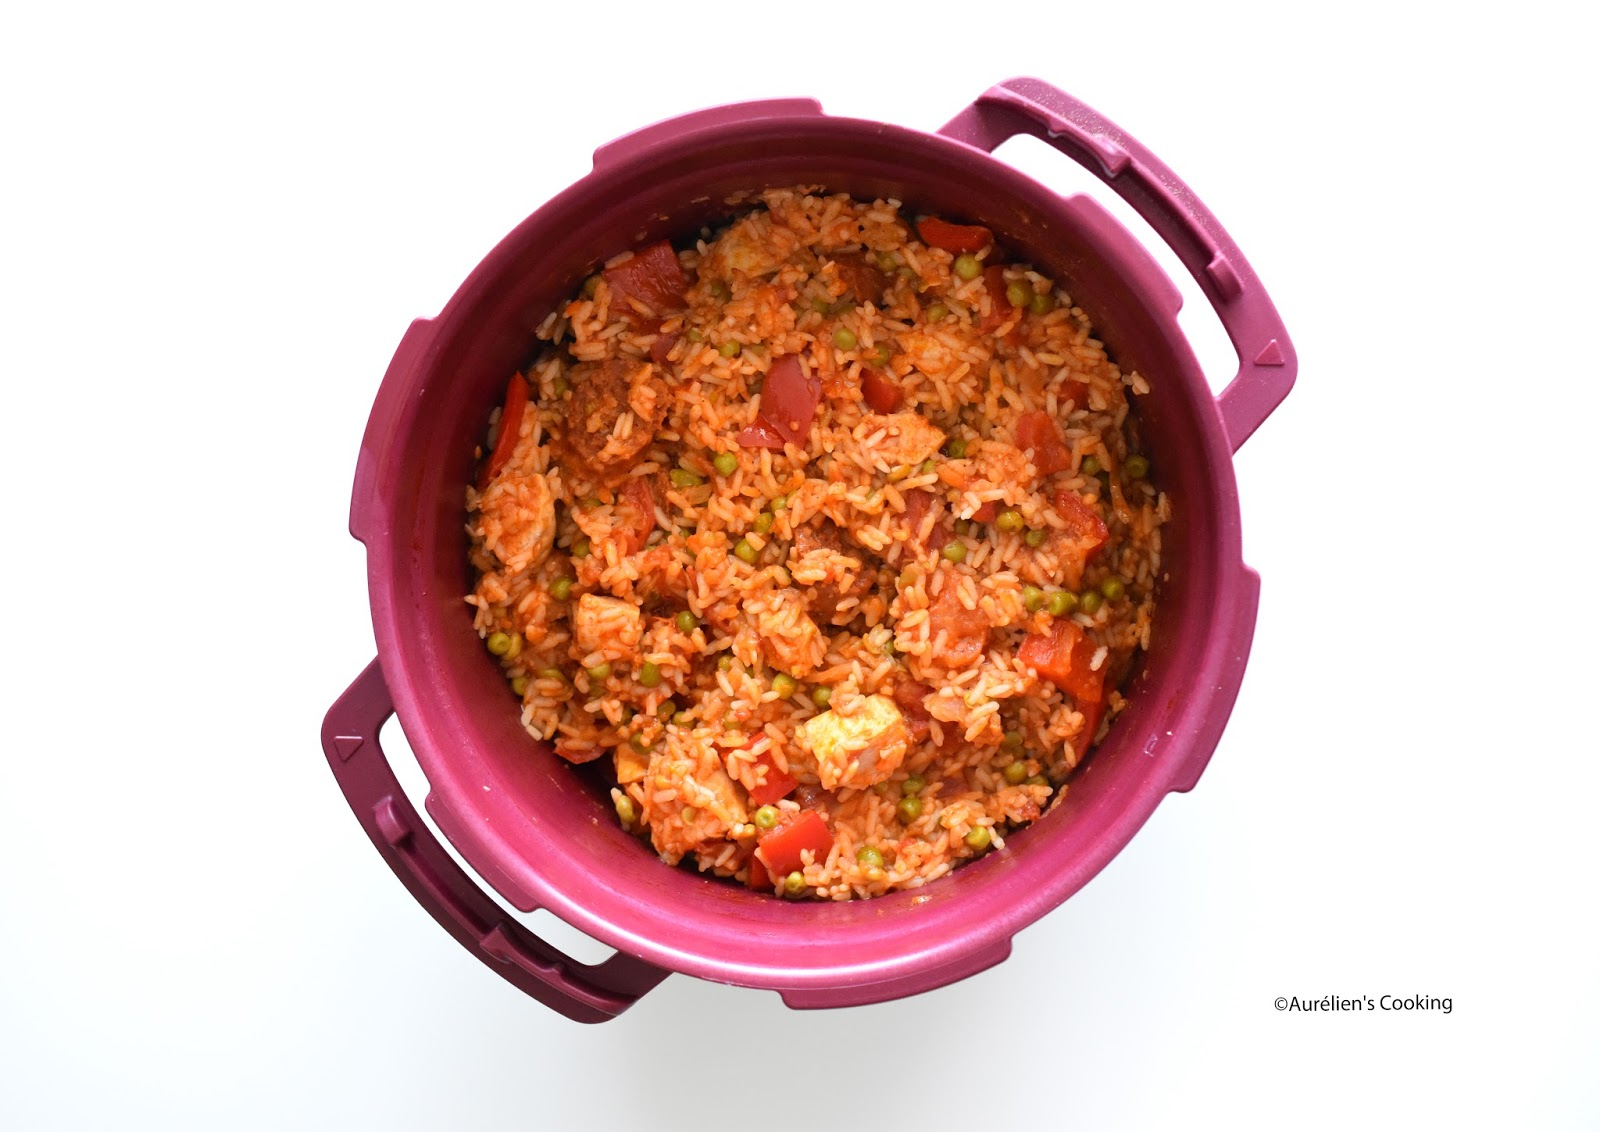 Aur lien 39 s cooking pa lla carnivore express au micro minute recette tupperware - Micro minute tupperware recette ...